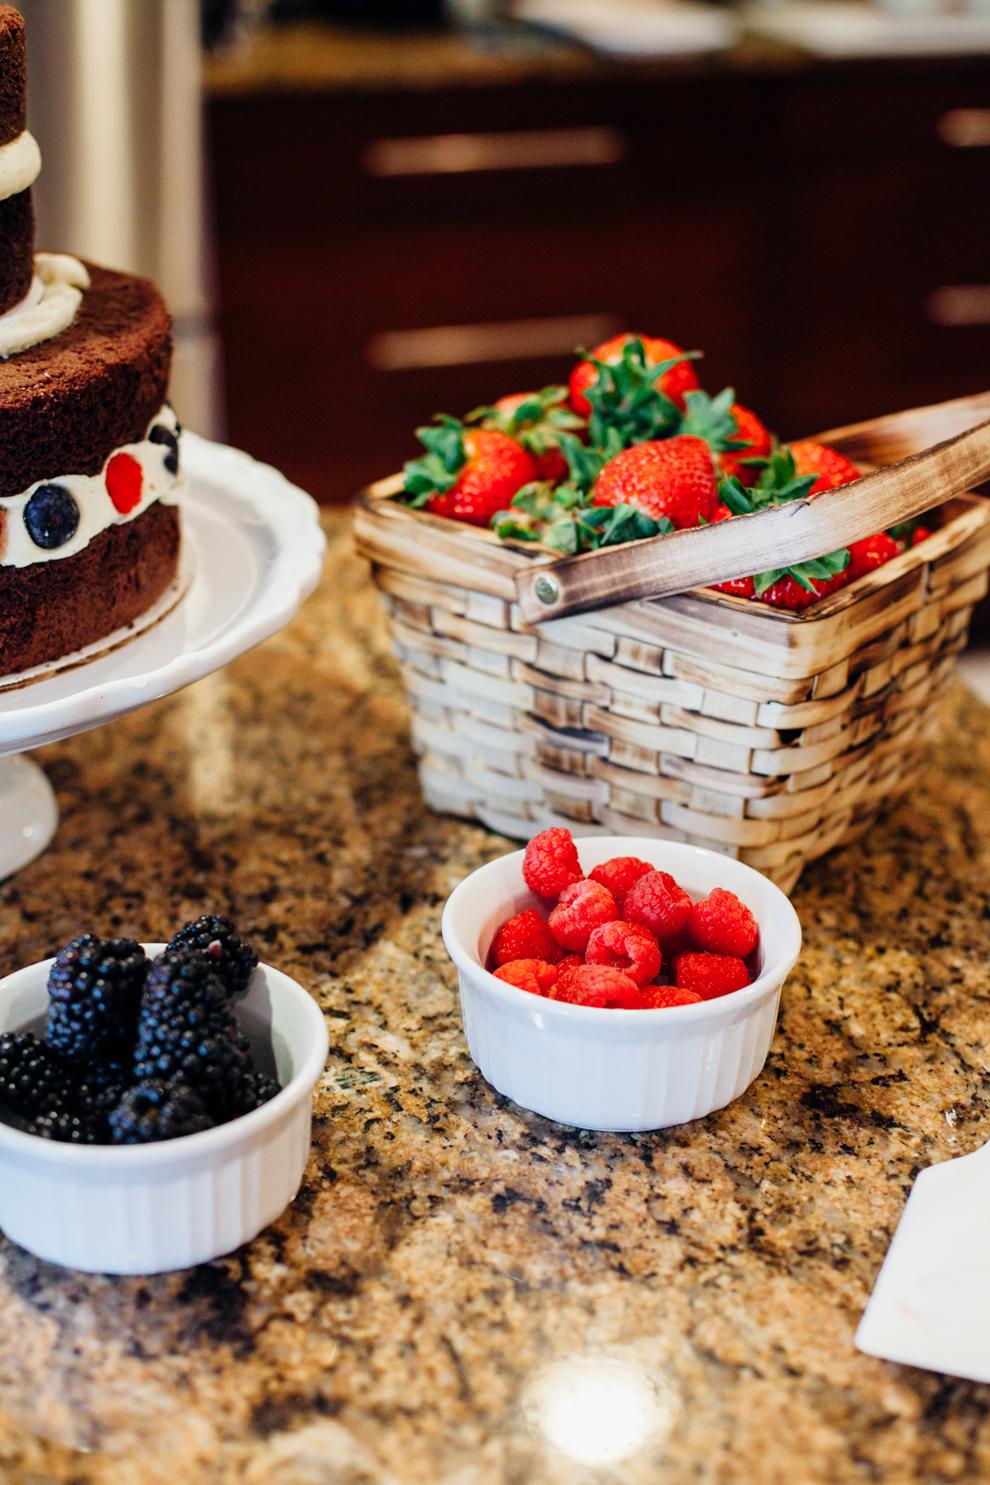 017-bellingham-marketing-photographer-bakery-slice-of-heaven-commercial-food-photo.jpg